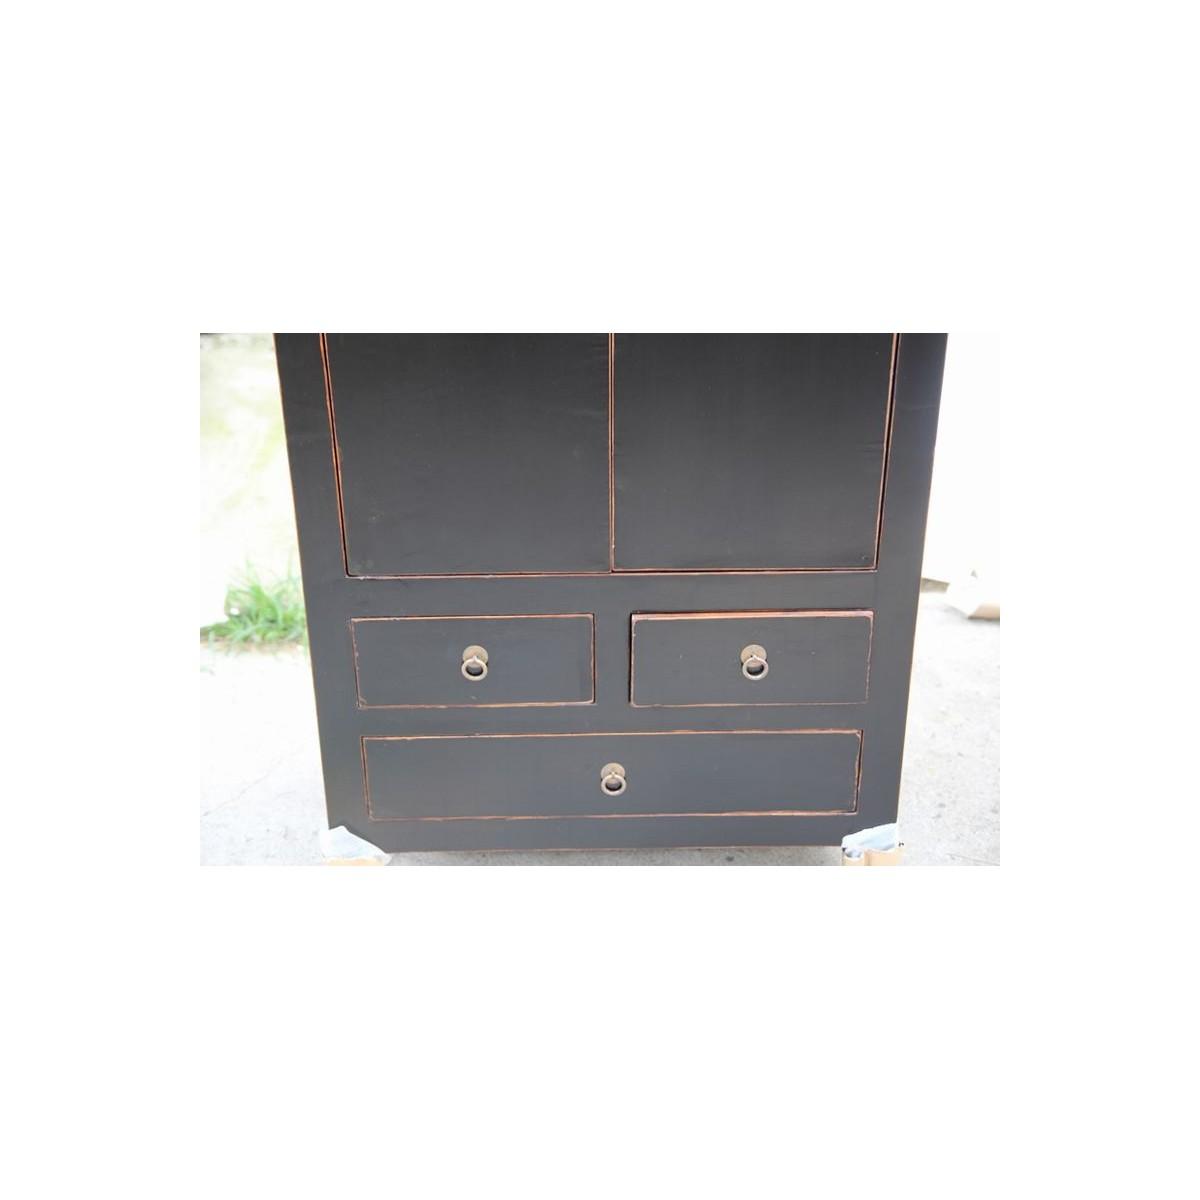 högt smalt skåp,kinesiske,kinaskåp,kinesiska möbler